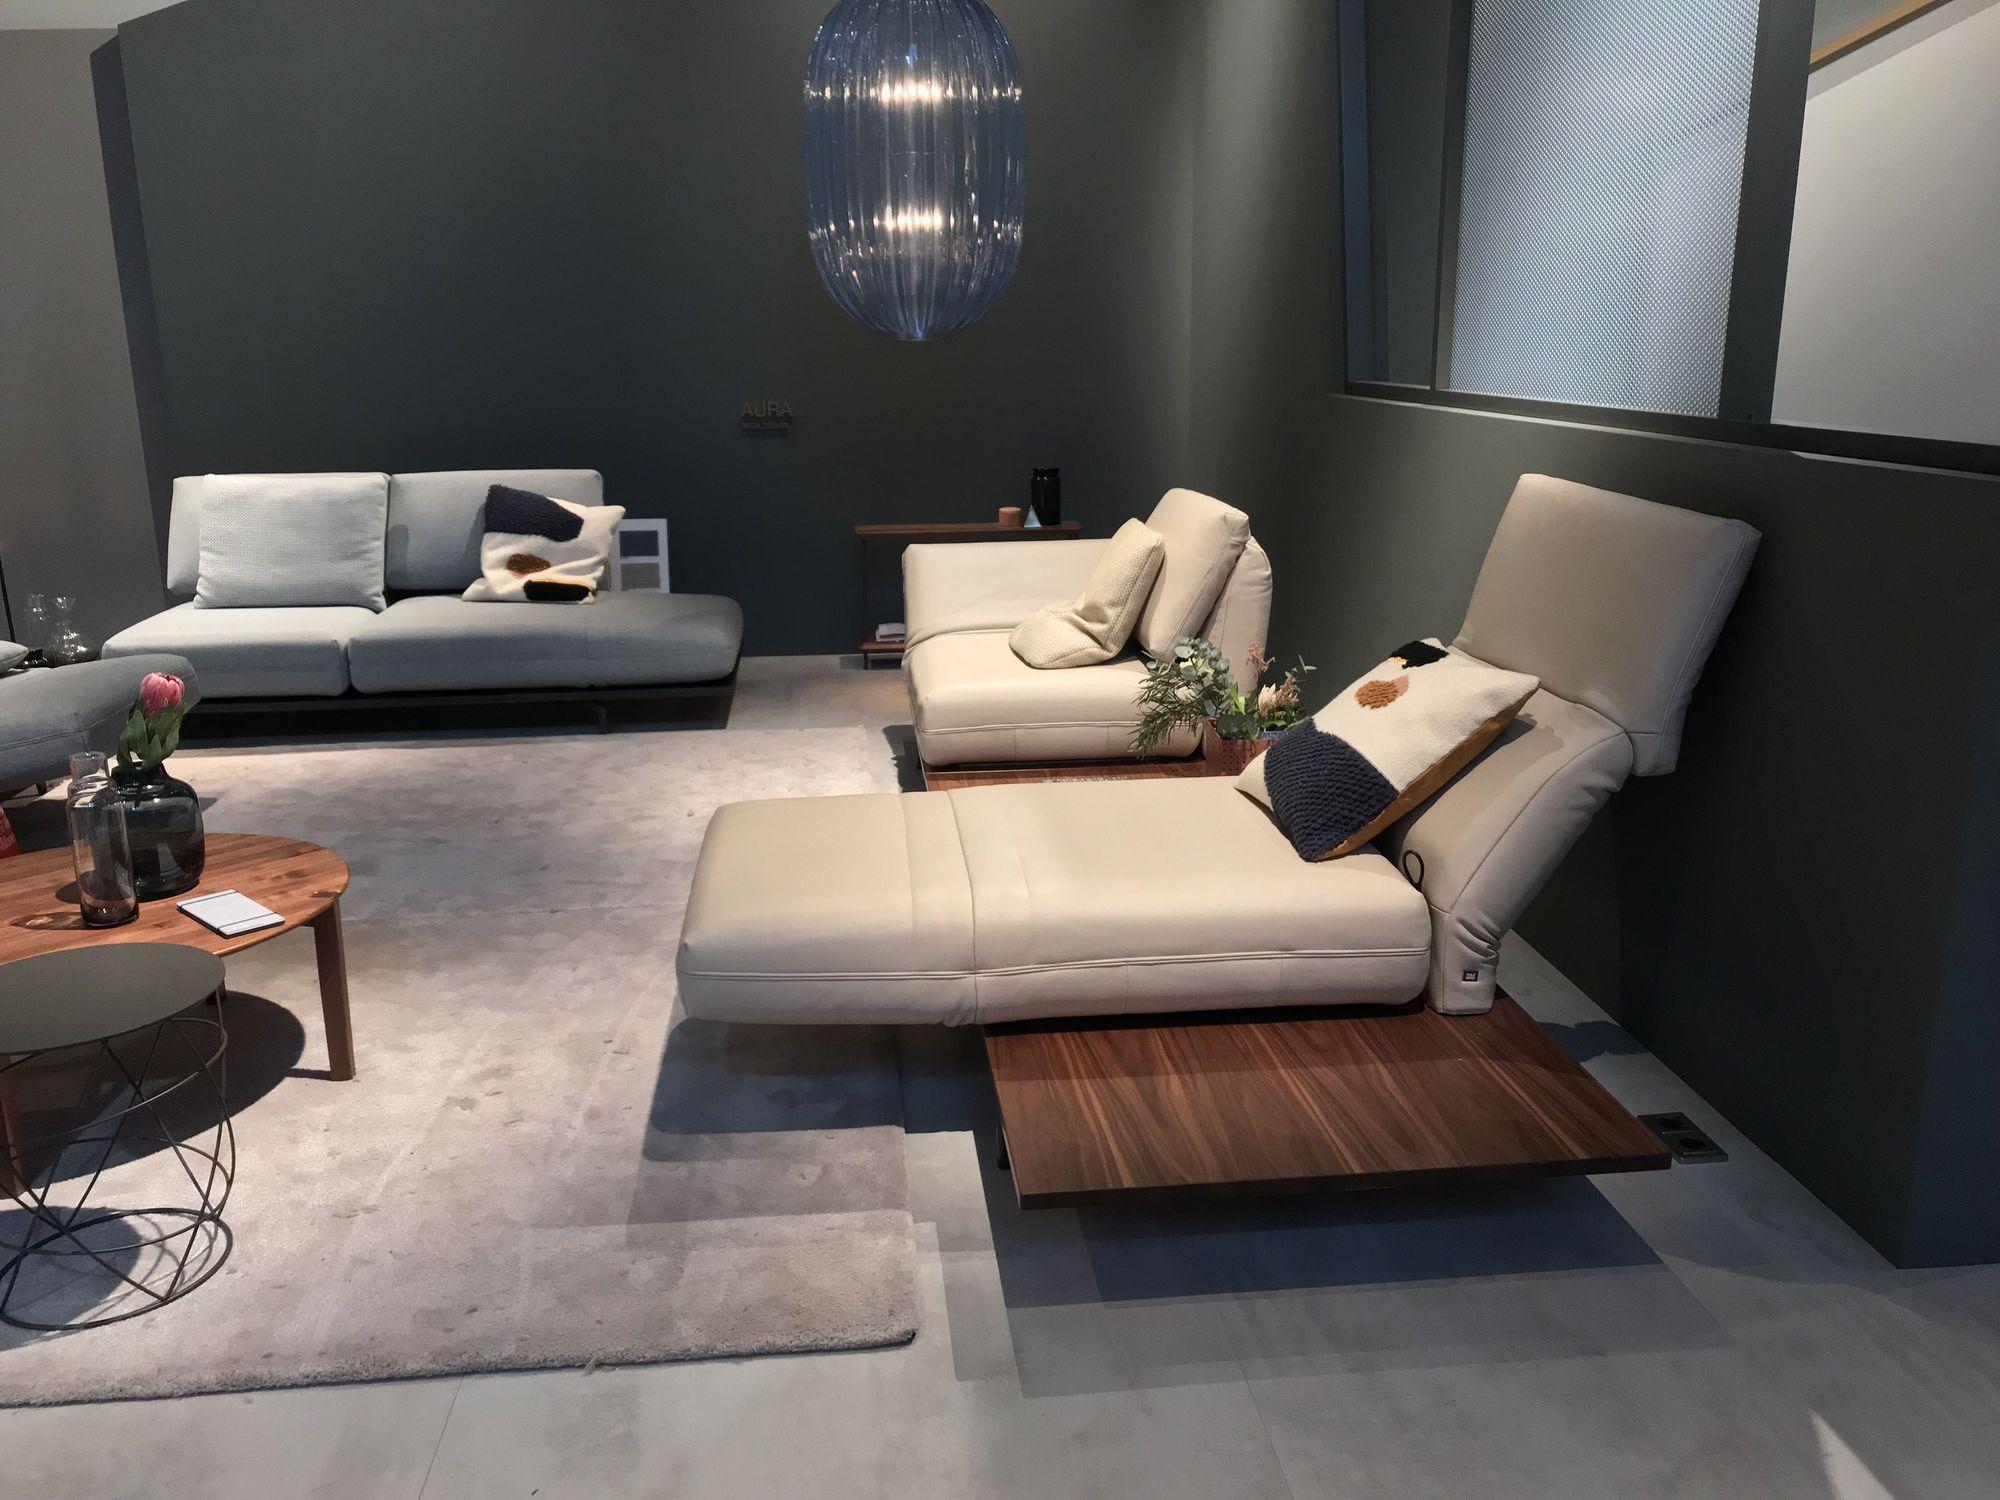 rolf benz aura sofa mit drehsitzen in leder auf plattform. Black Bedroom Furniture Sets. Home Design Ideas